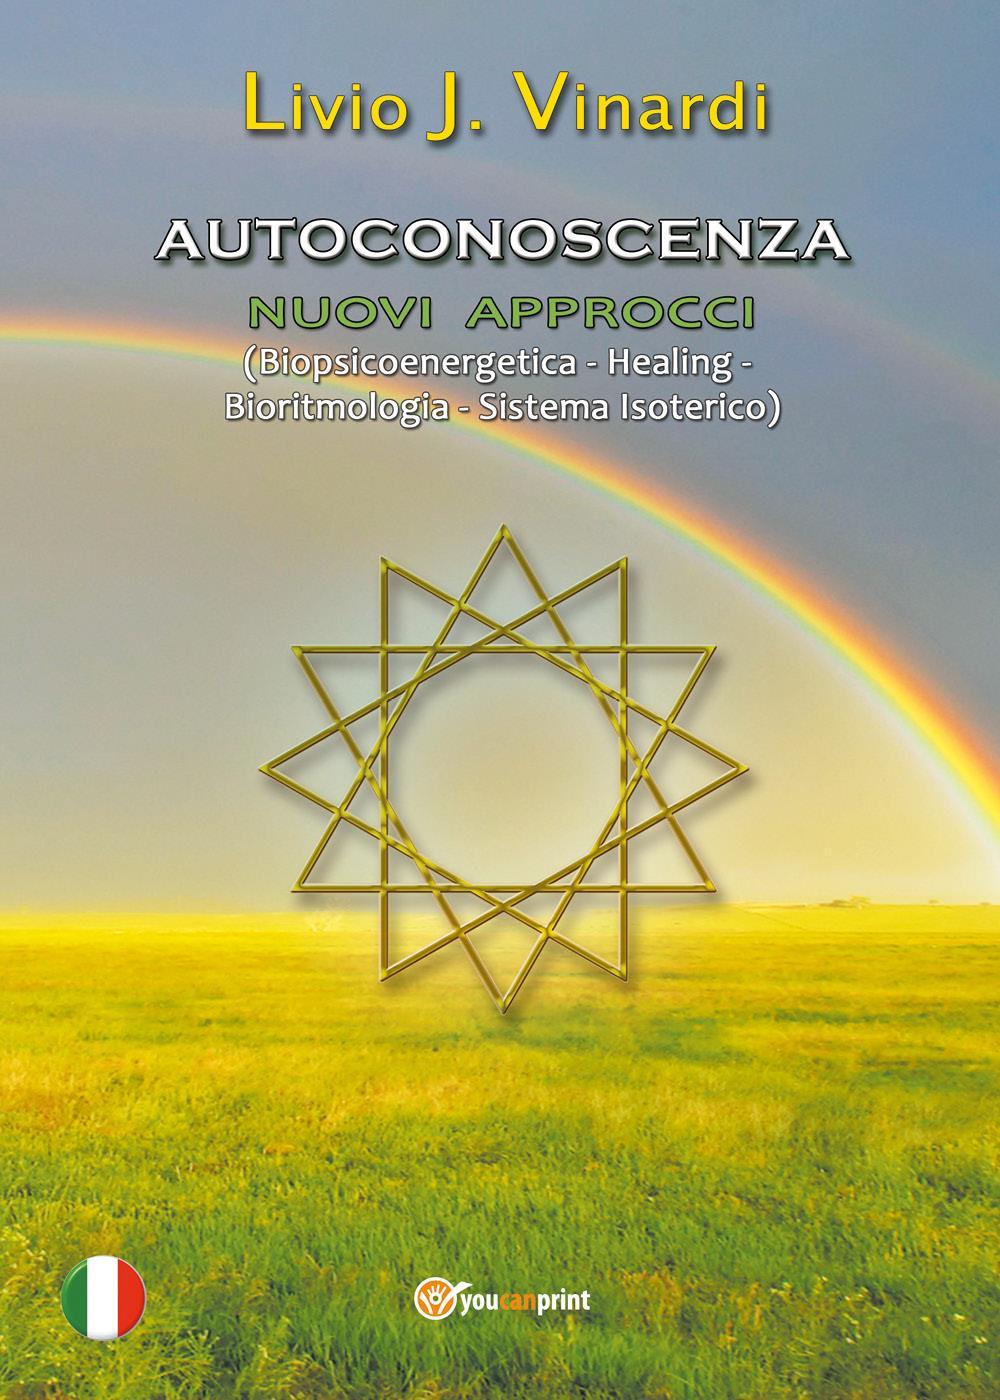 AUTOCONOSCENZA - Nuovi approcci (Biopsicoenergetica - Healing - Bioritmologia - Sistema Isoterico)